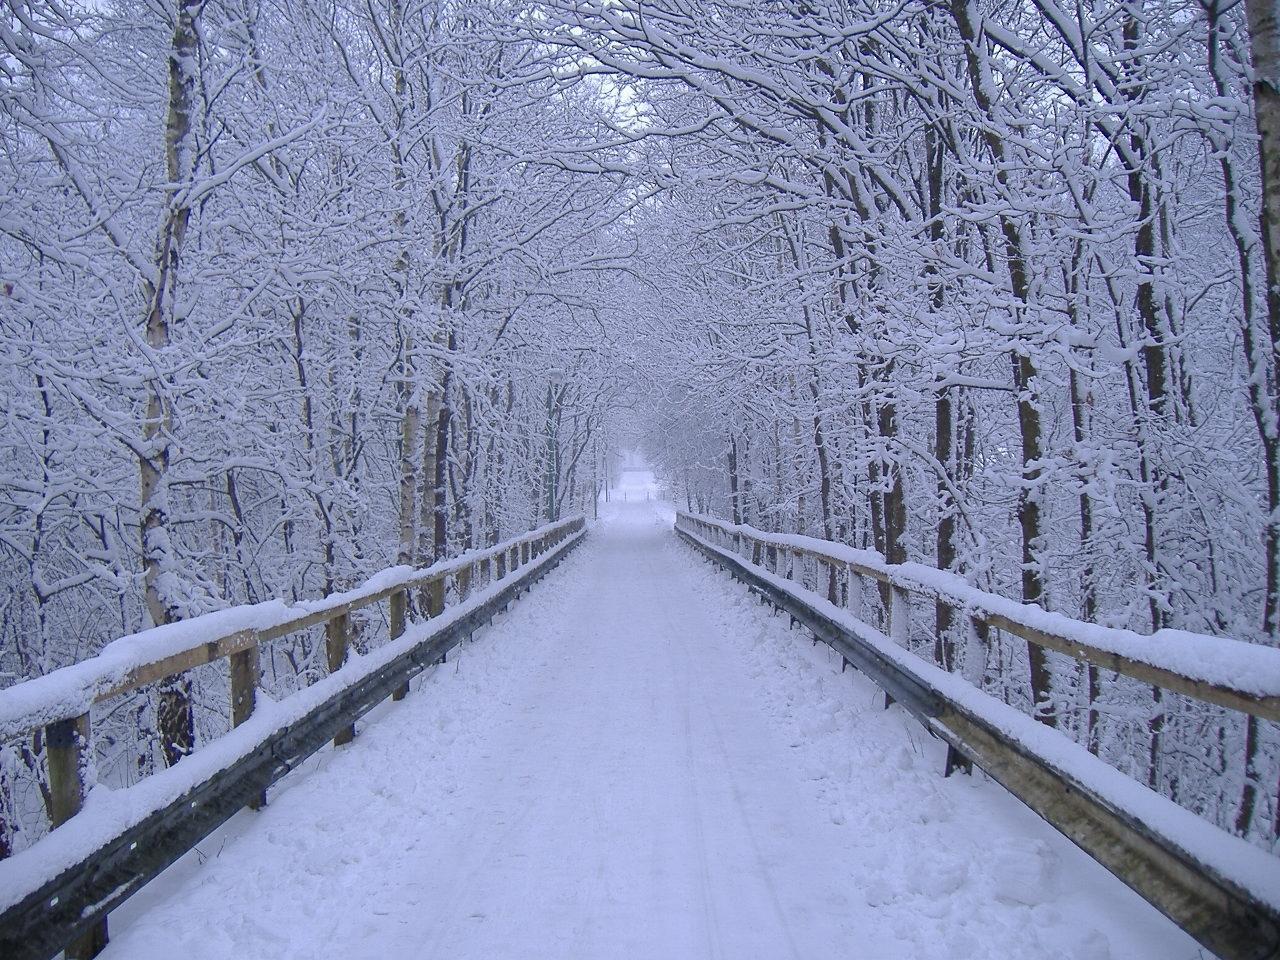 47] Winter Snow Scenes Wallpaper on WallpaperSafari 1280x960